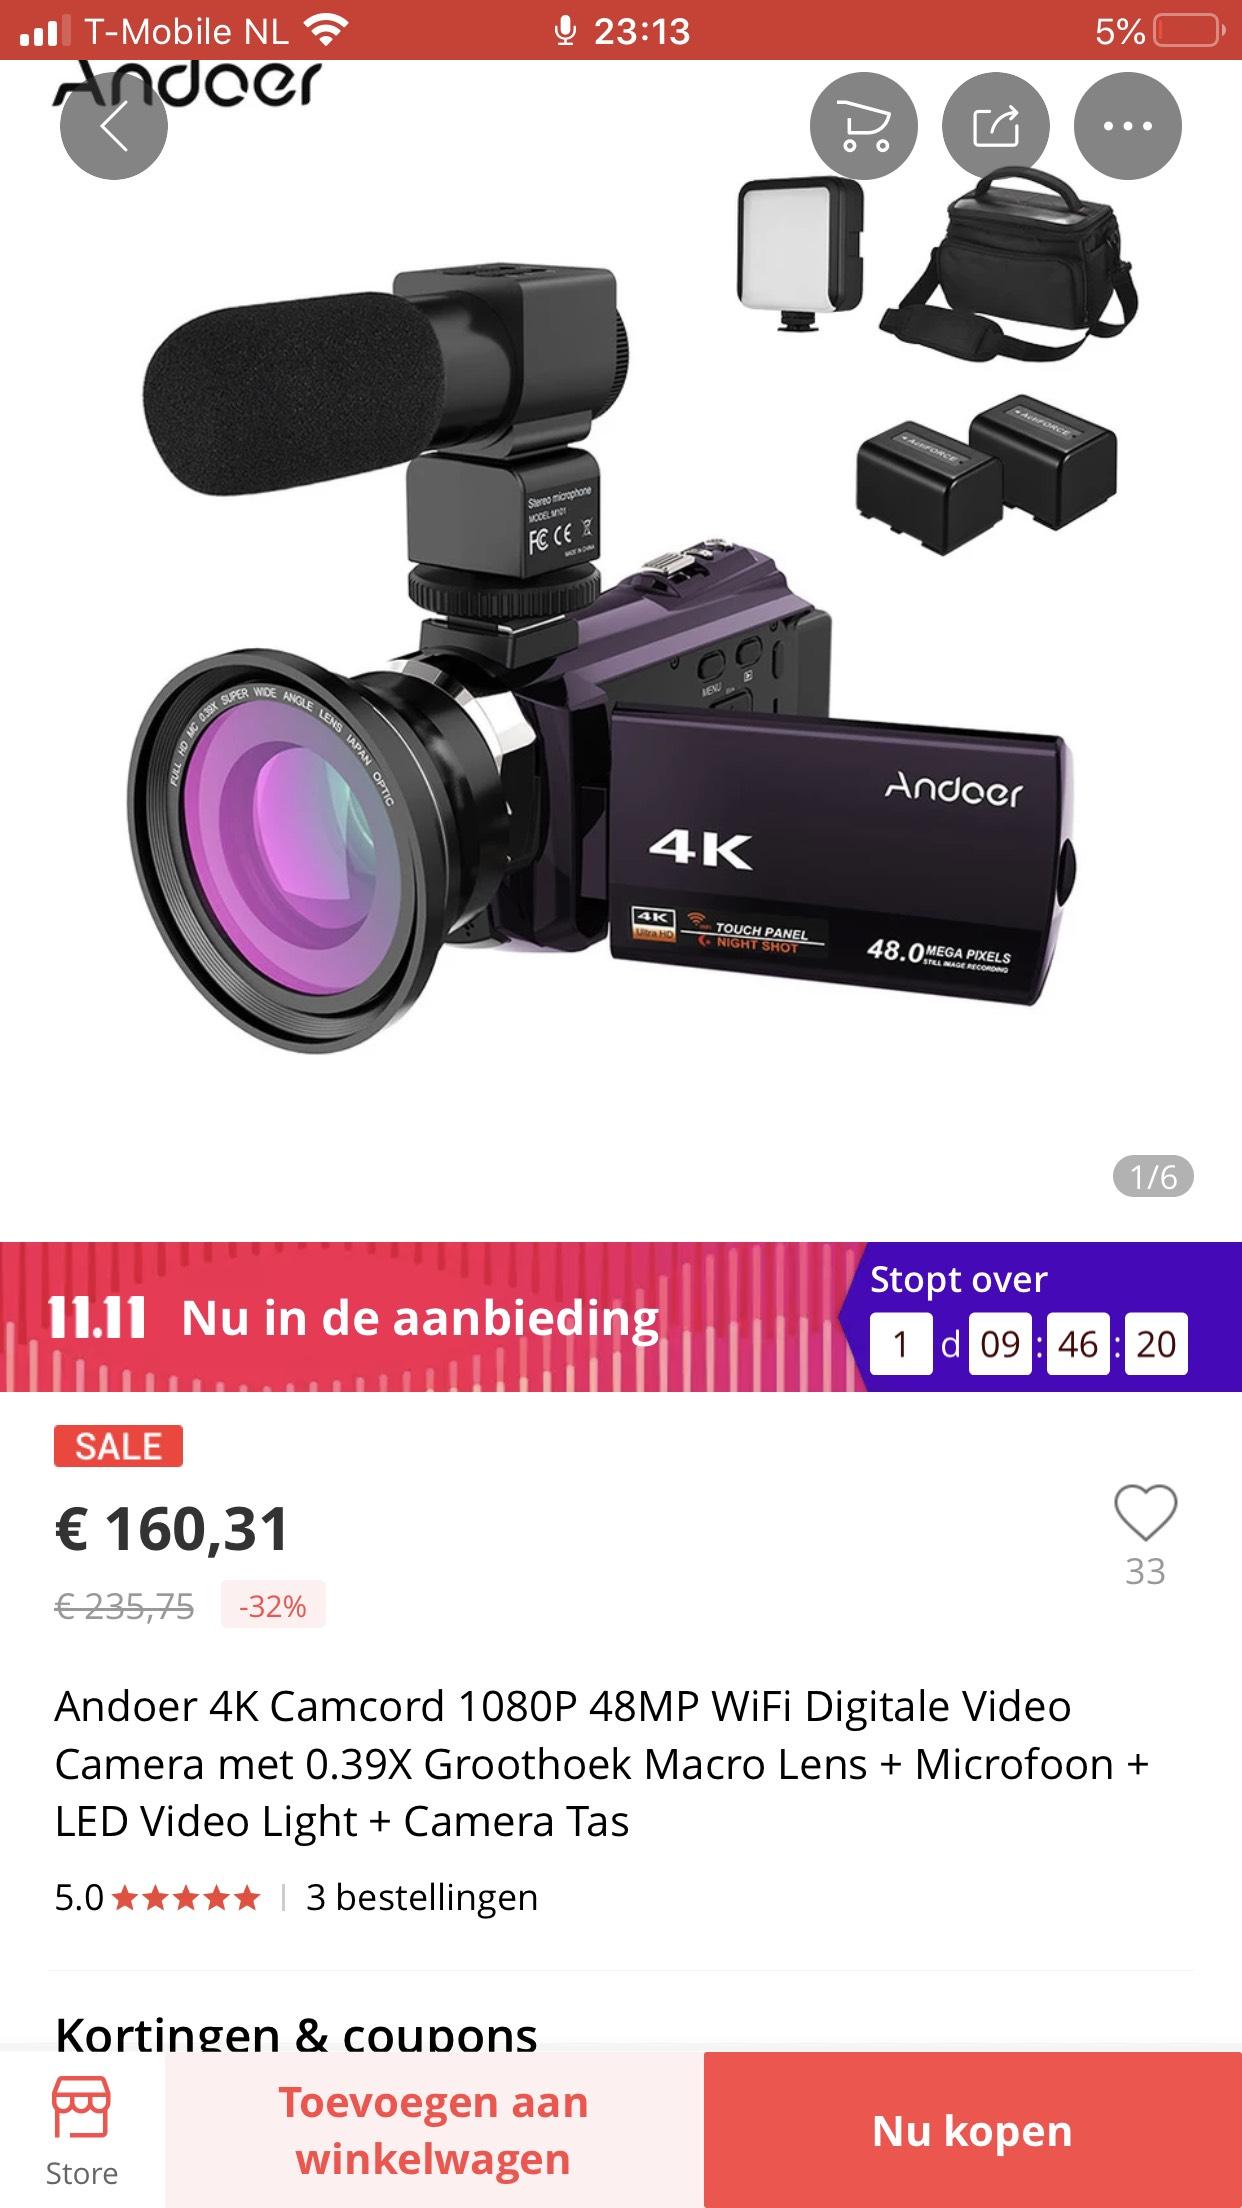 Andoer 4K 48MP camera met accessoires